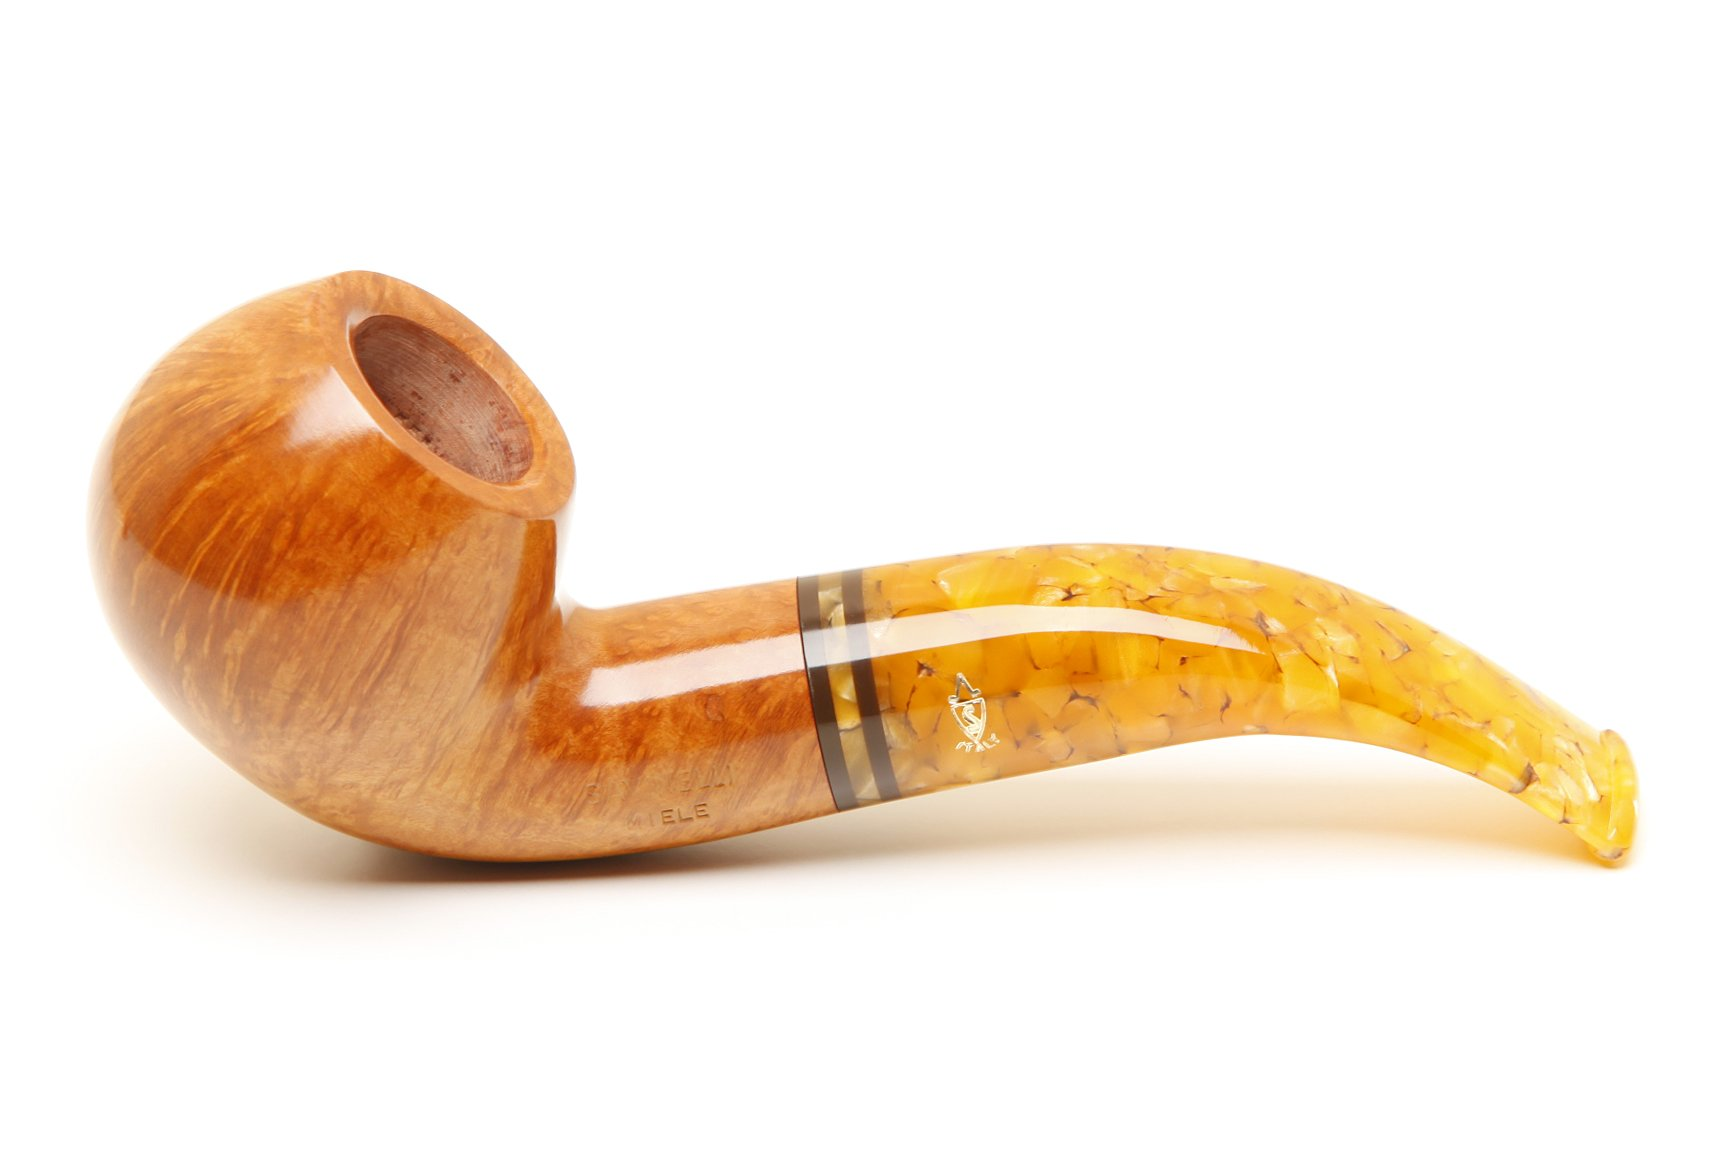 Savinelli Miele Honey Pipe 642 Tobacco Pipe by Savinelli